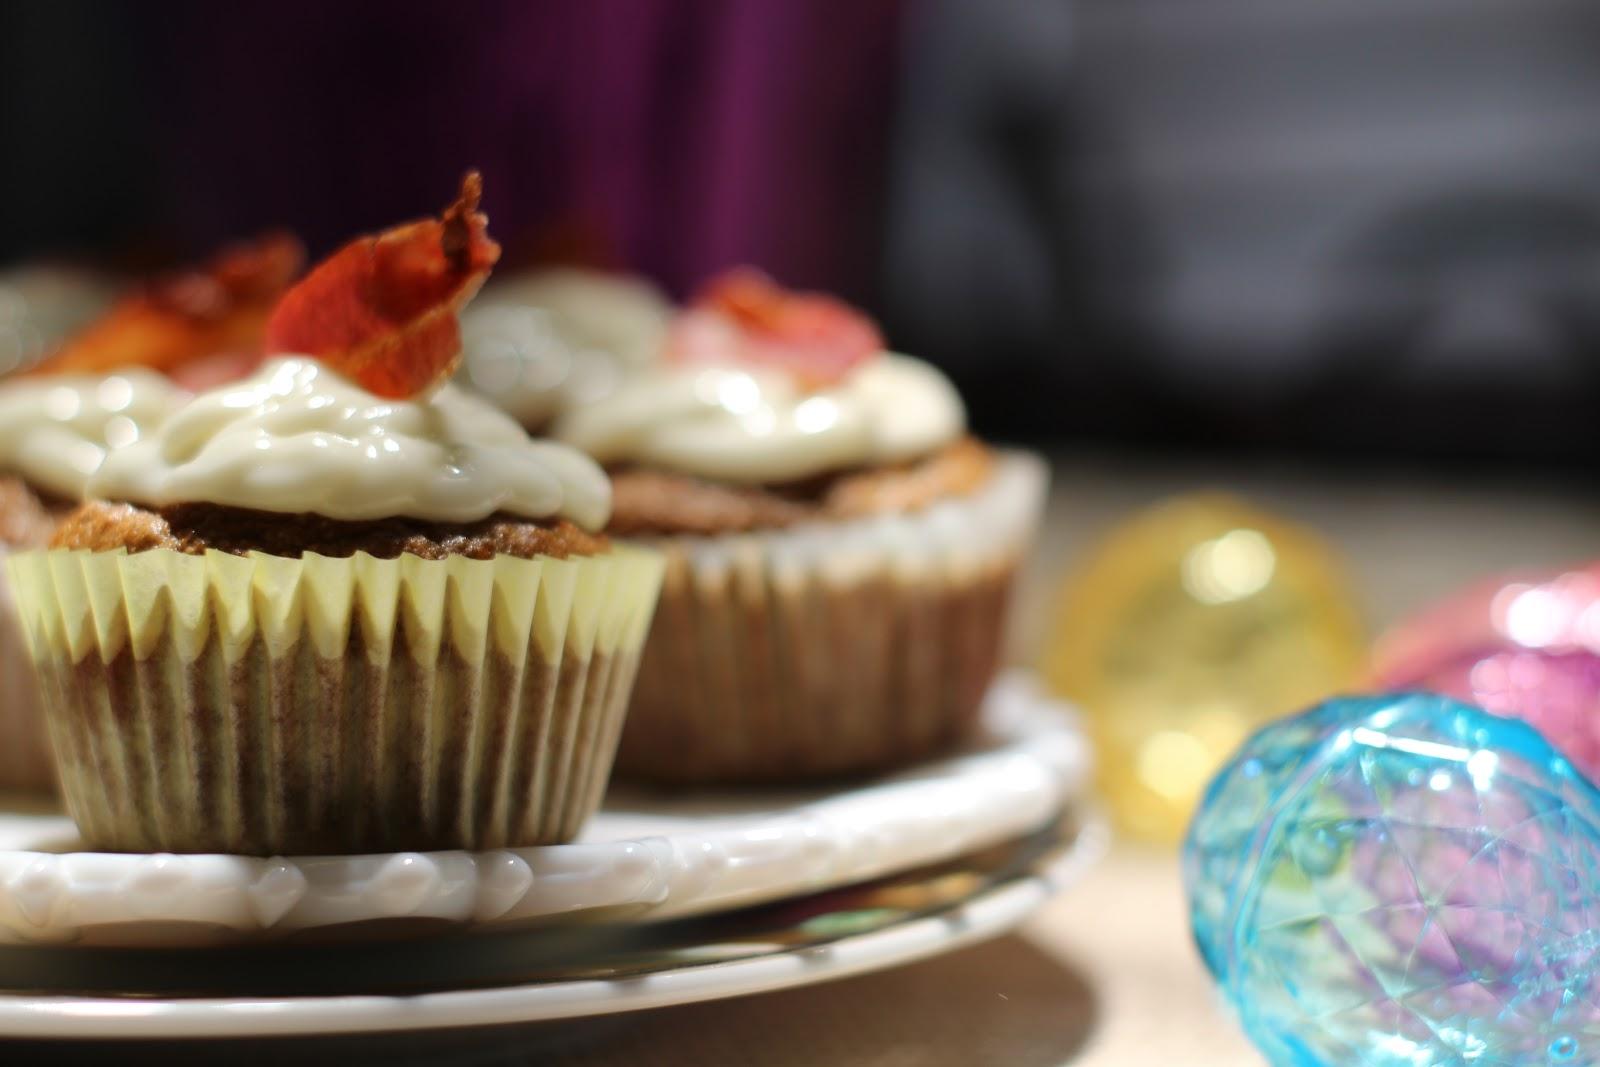 Gluten-Free, no refined sugar, dairy or xanthan gum